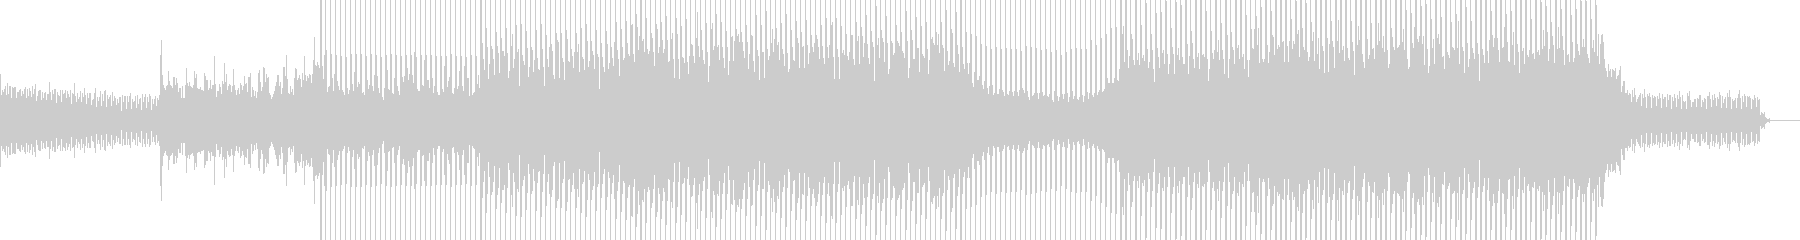 EDMポップで明るいクラブ系-13の未再生の波形